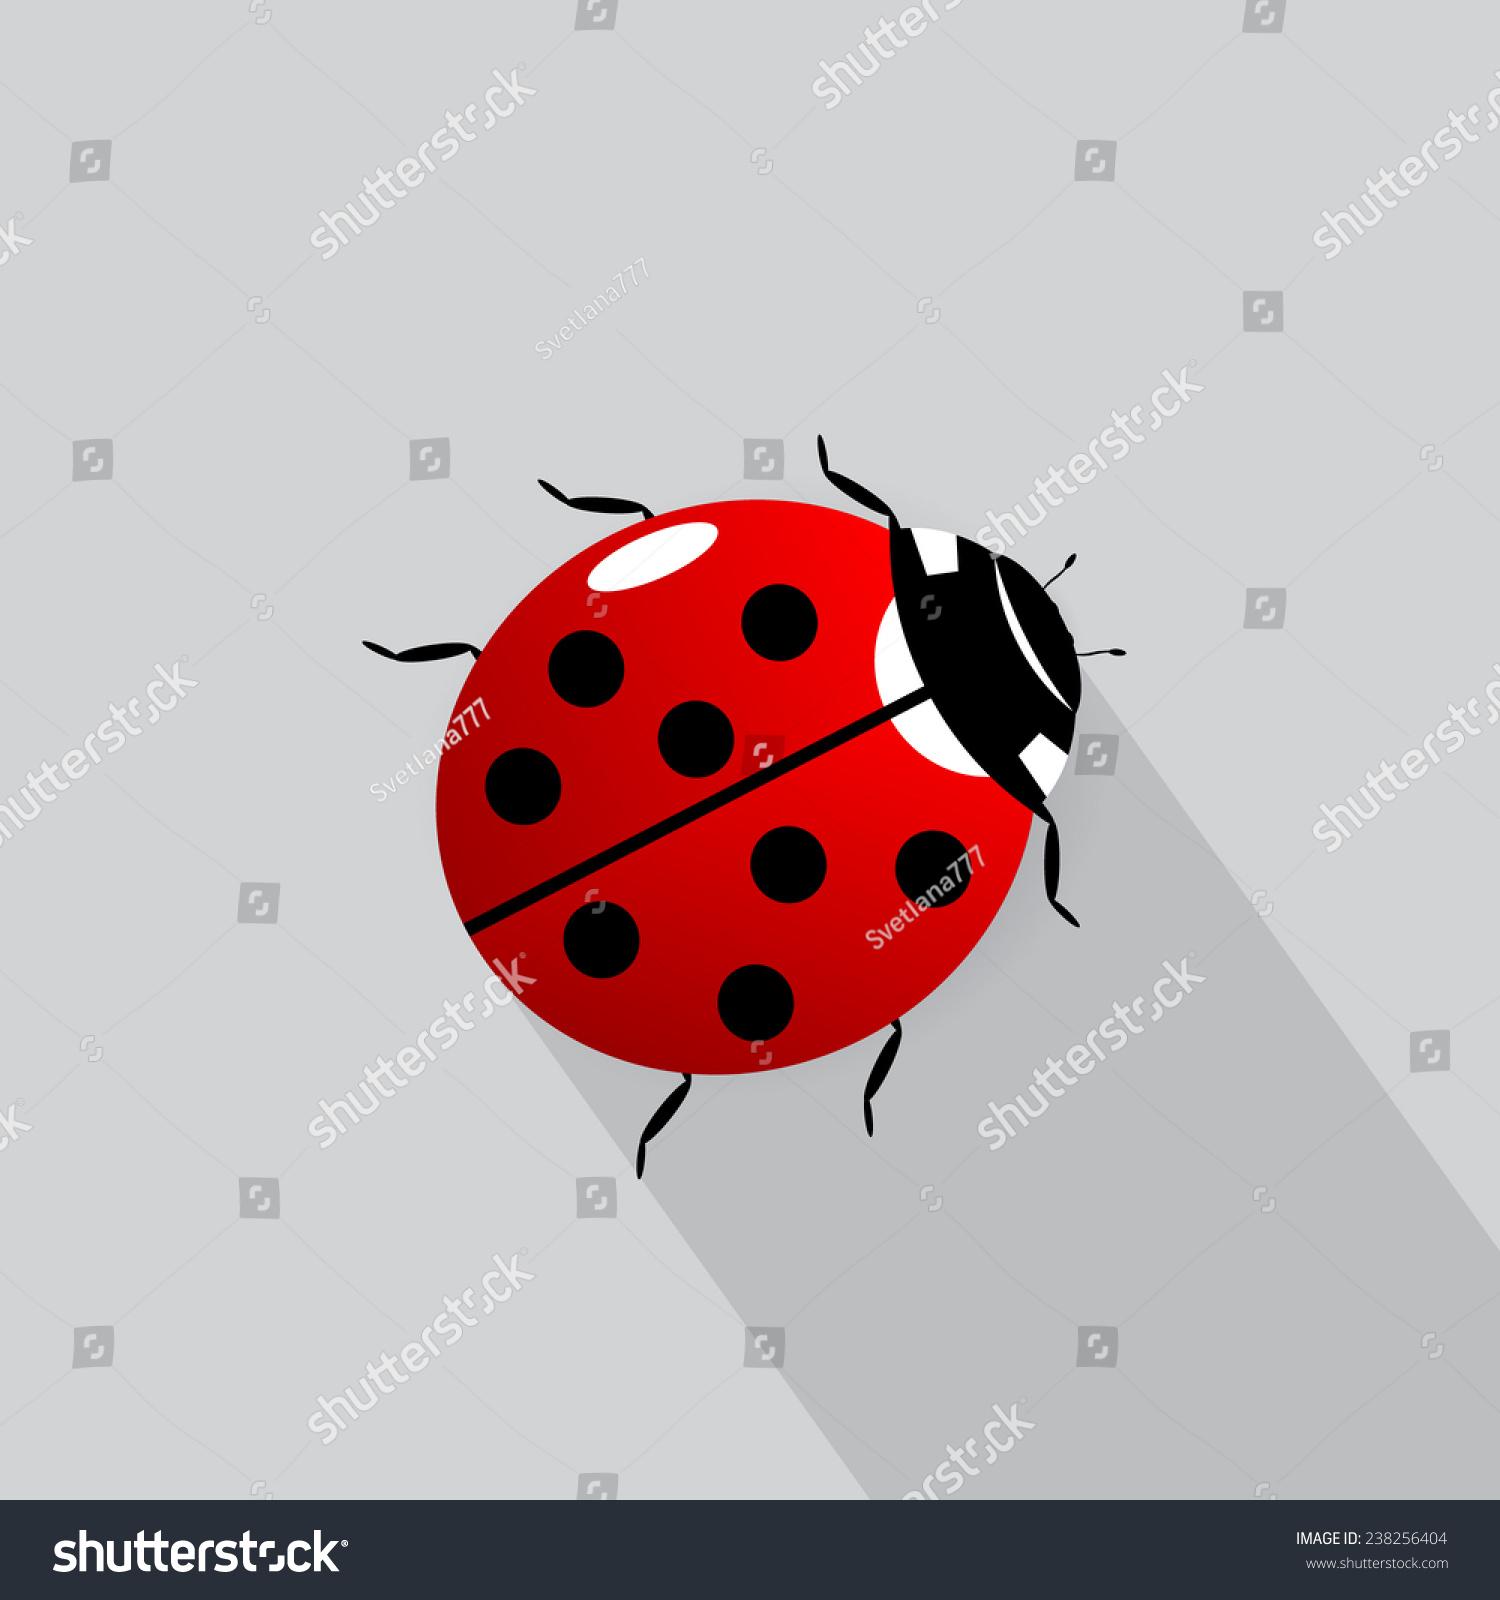 Vector illustration of a ladybug | EZ Canvas